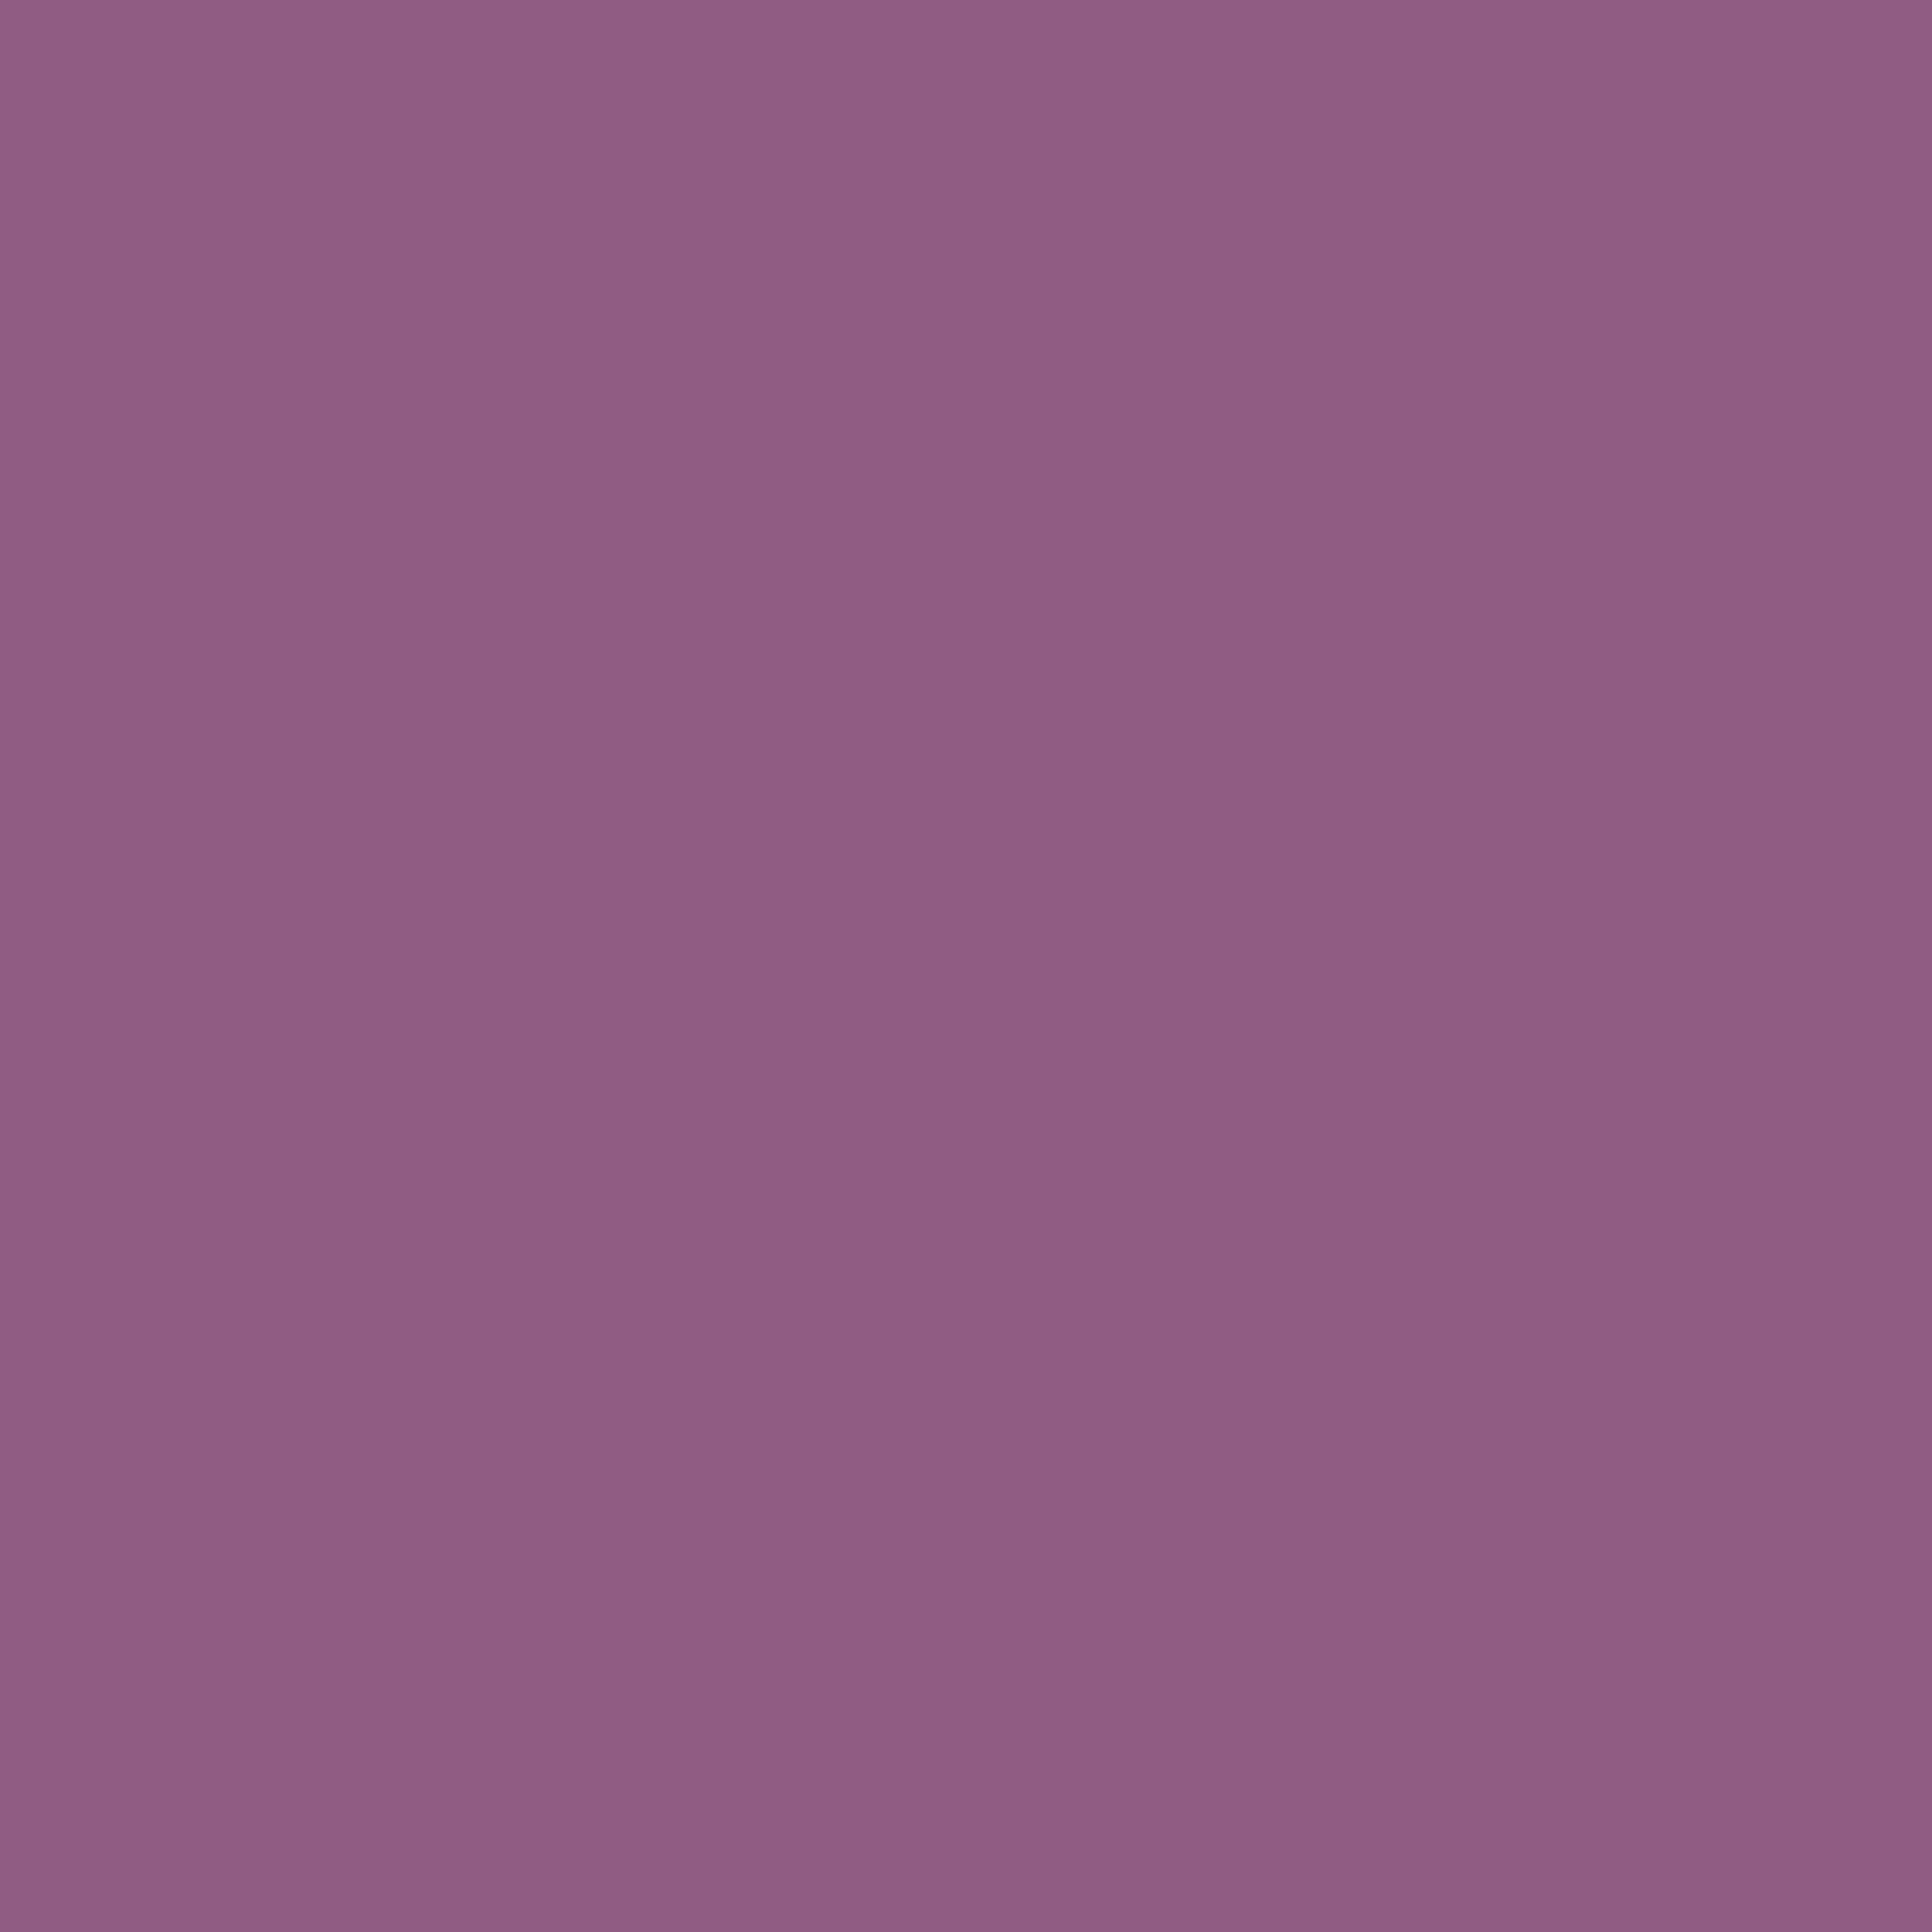 2048x2048 Antique Fuchsia Solid Color Background